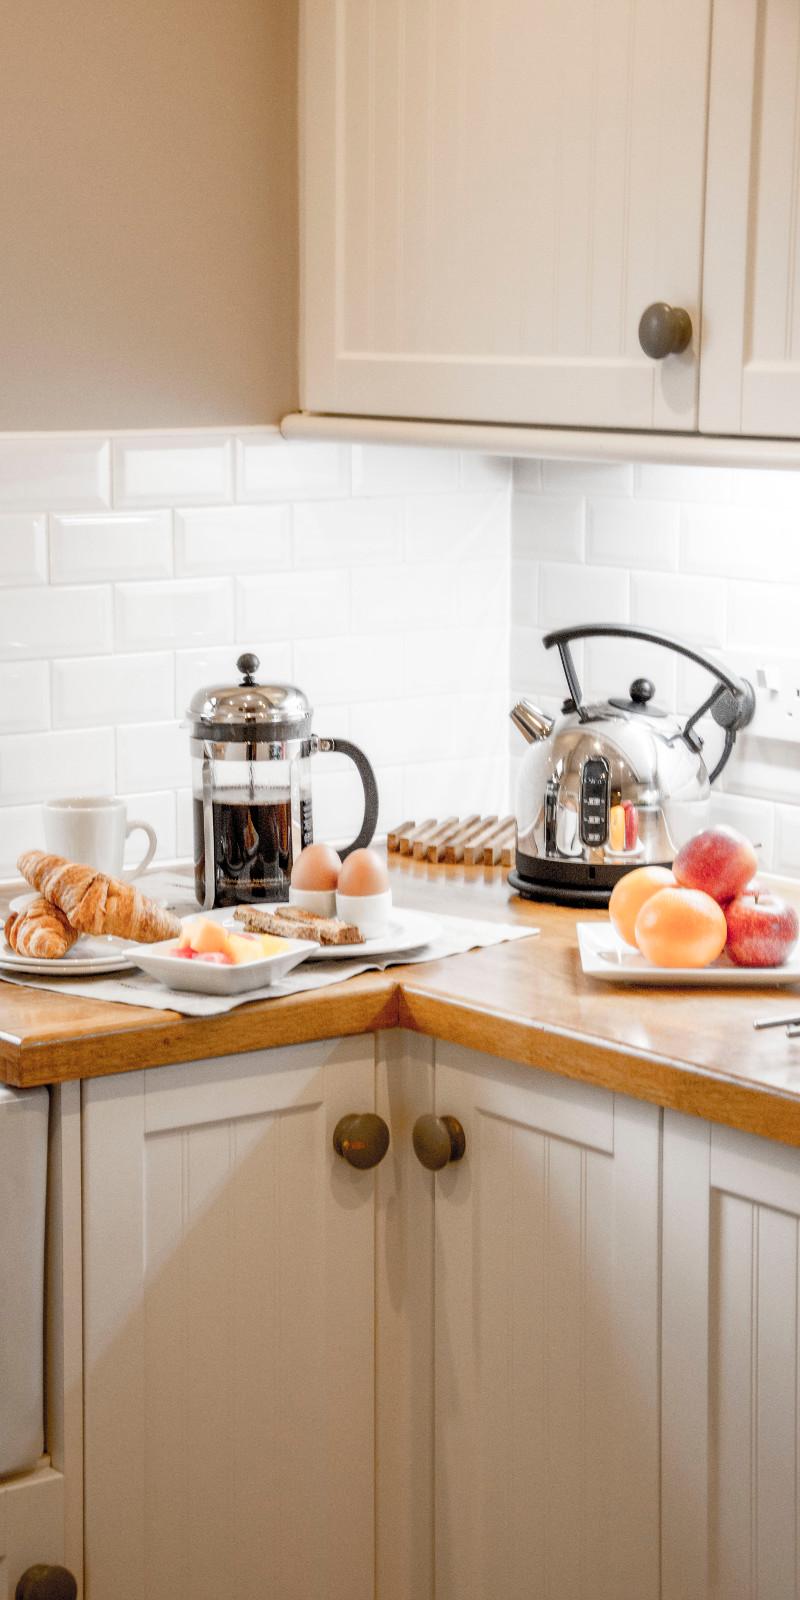 125 Seatown Family Holiday Kitchen